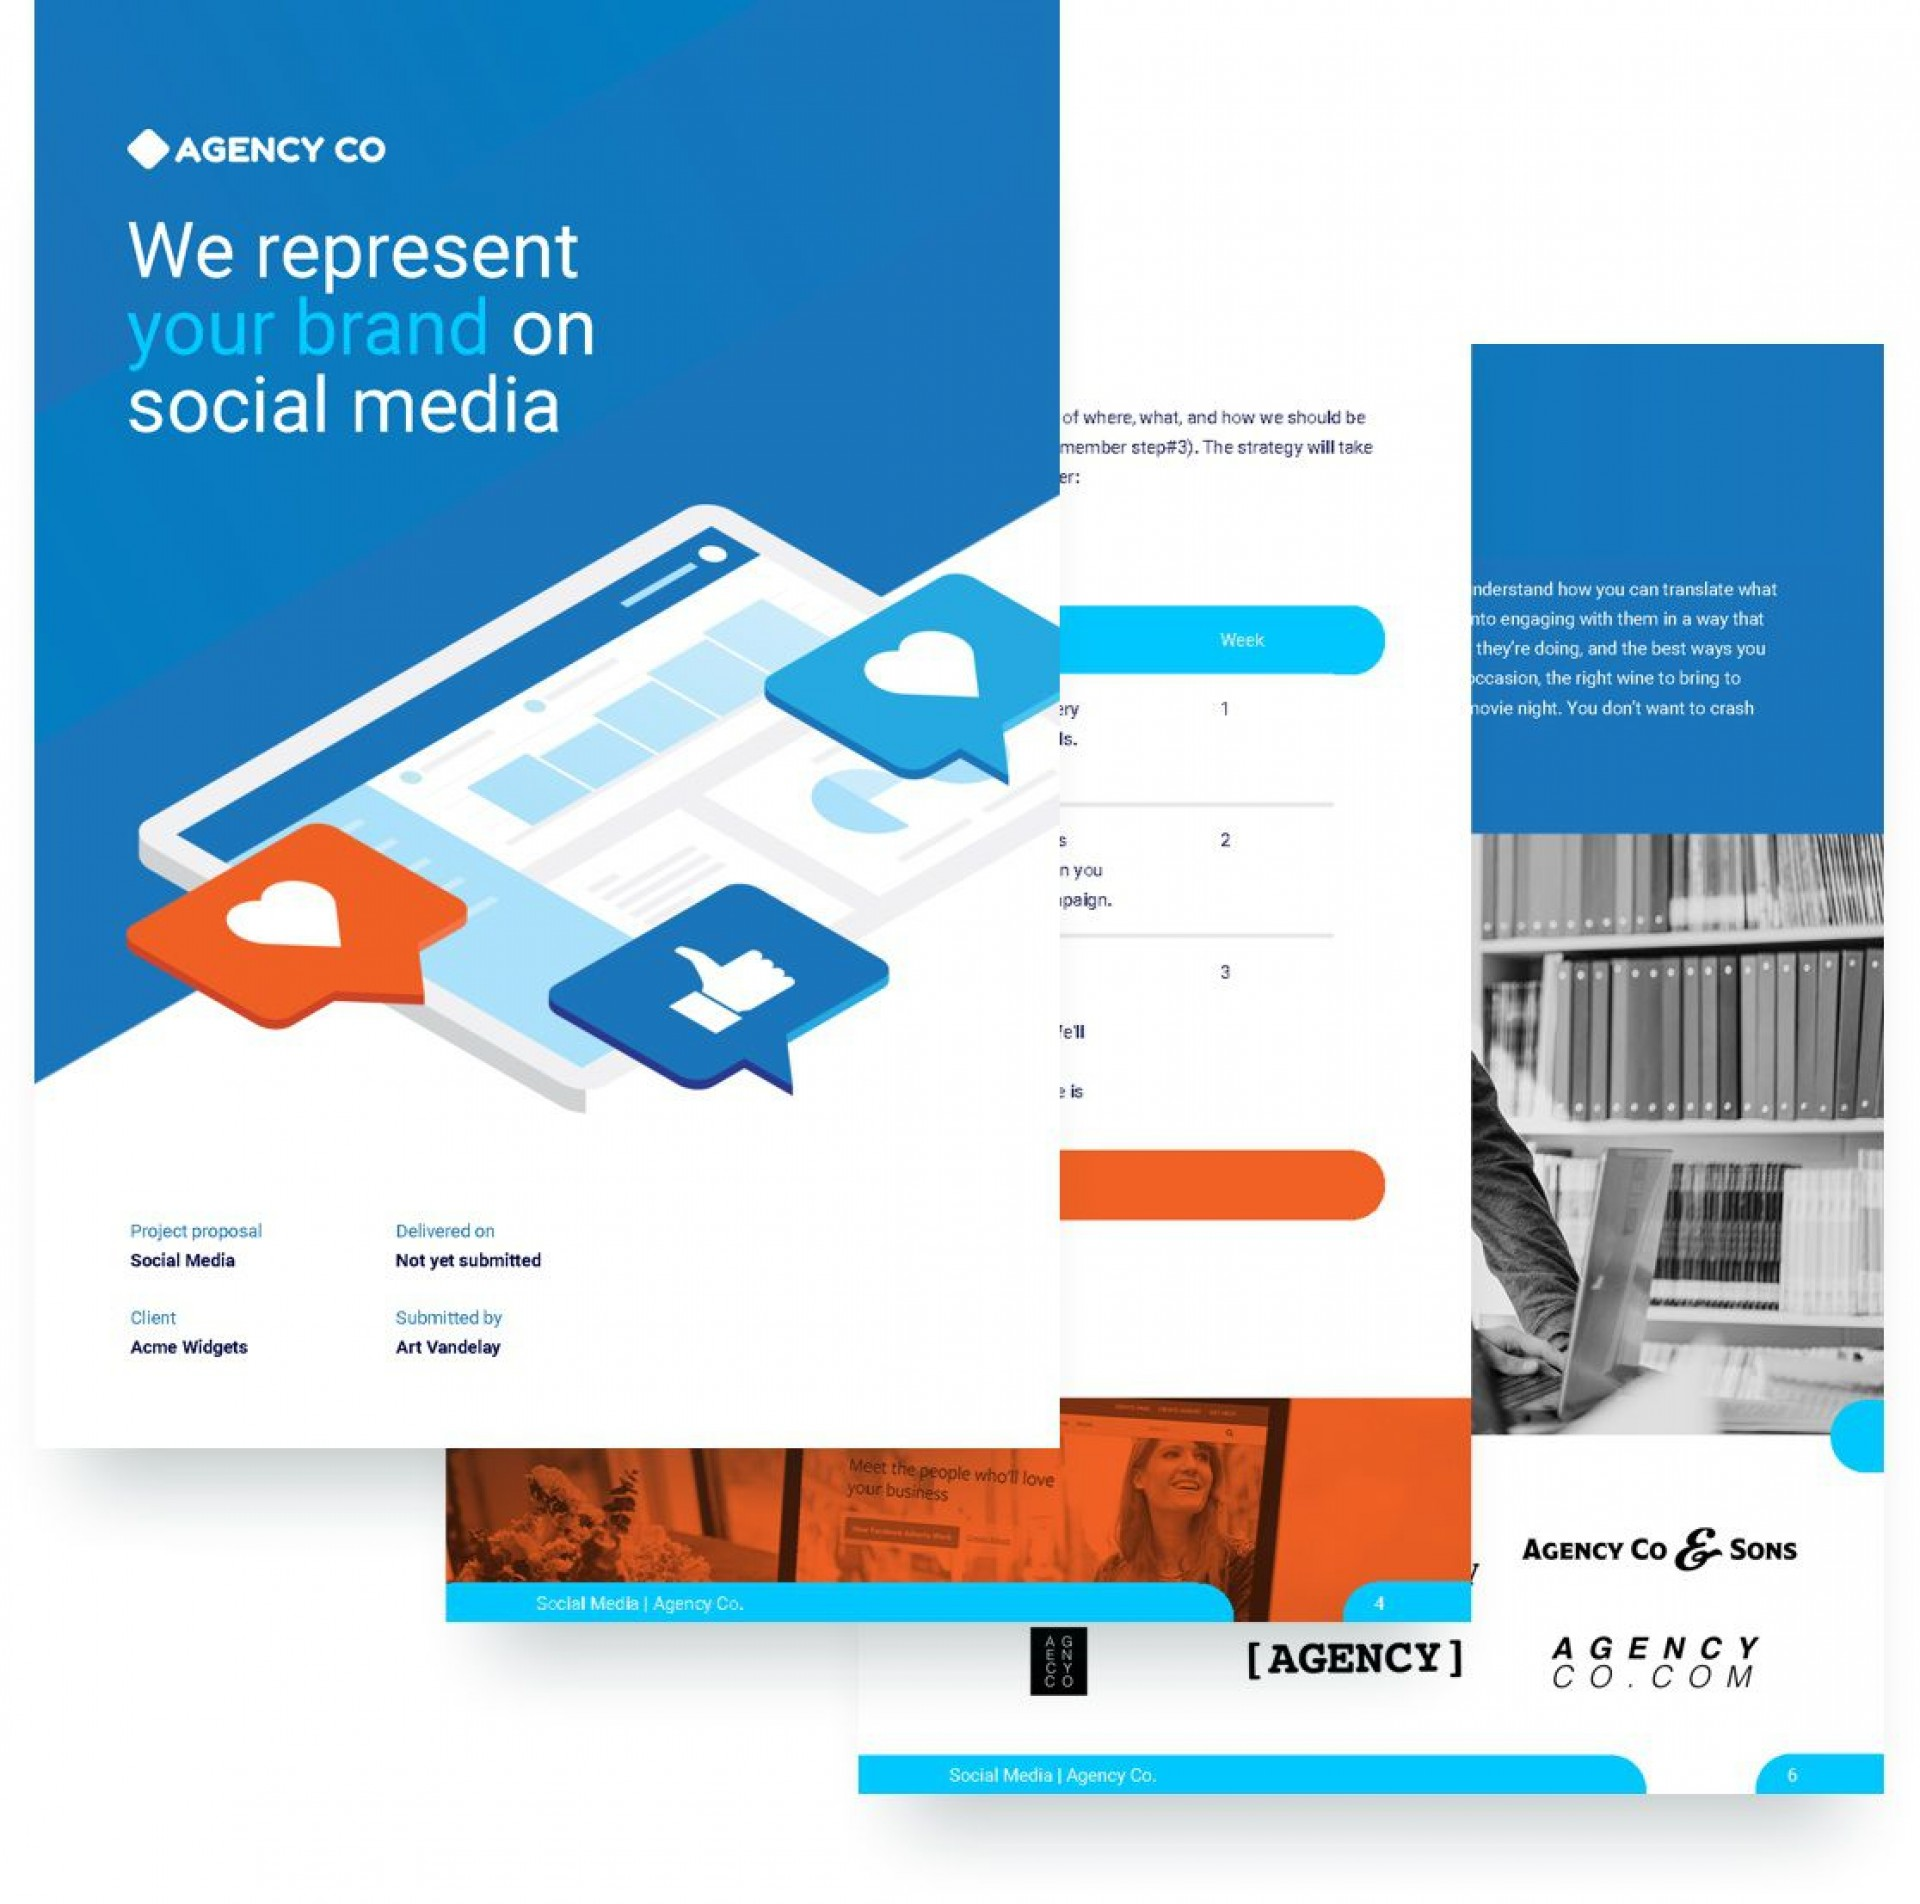 008 Breathtaking Social Media Proposal Template Photo  Ppt Marketing Word 20191920